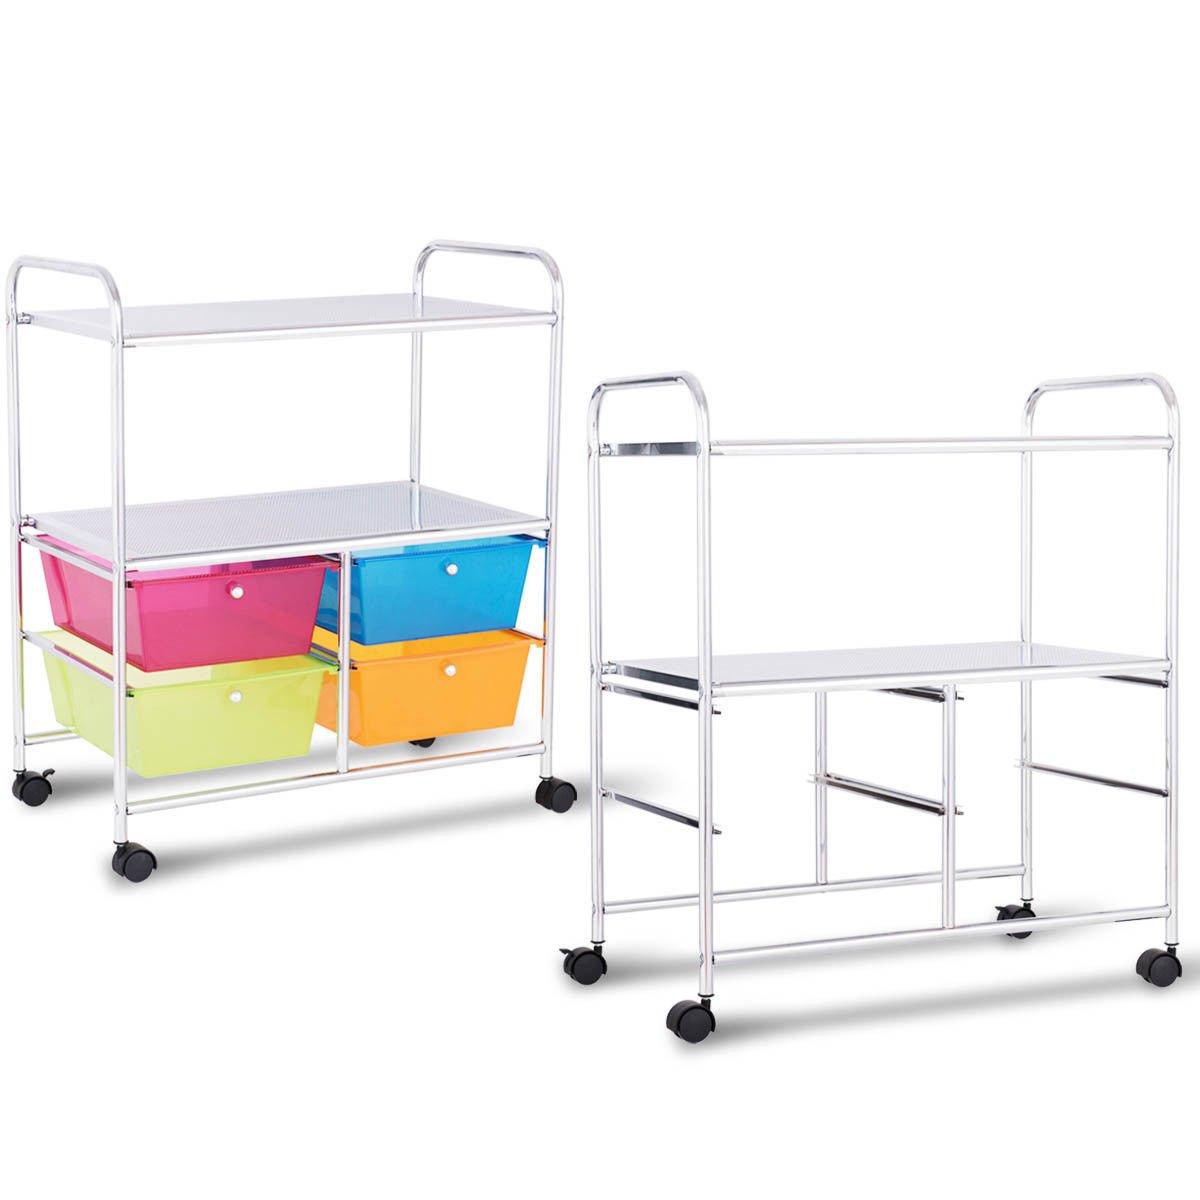 Giantex Rolling Storage Cart w/ 4 Drawers 2 Shelves Metal Rack Shelf Home Office School Beauty Salon Utility Organizer Cart with Wheels (Blue Green Orange & Red) by Giantex (Image #8)